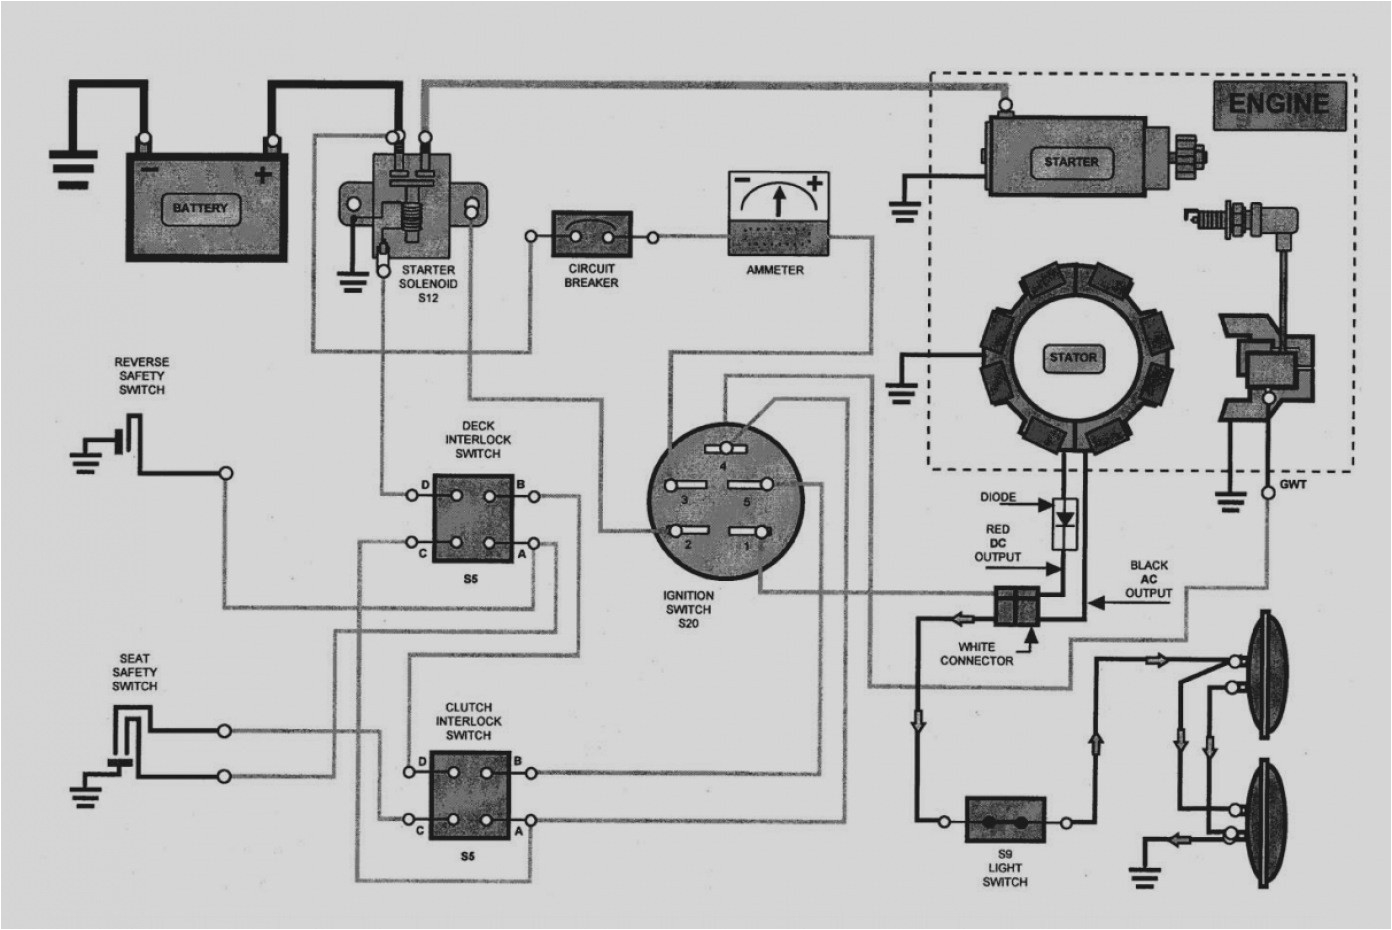 riding mower wire diagram wiring diagram toolboxmtd electrical diagram wiring diagram used murray riding mower electrical